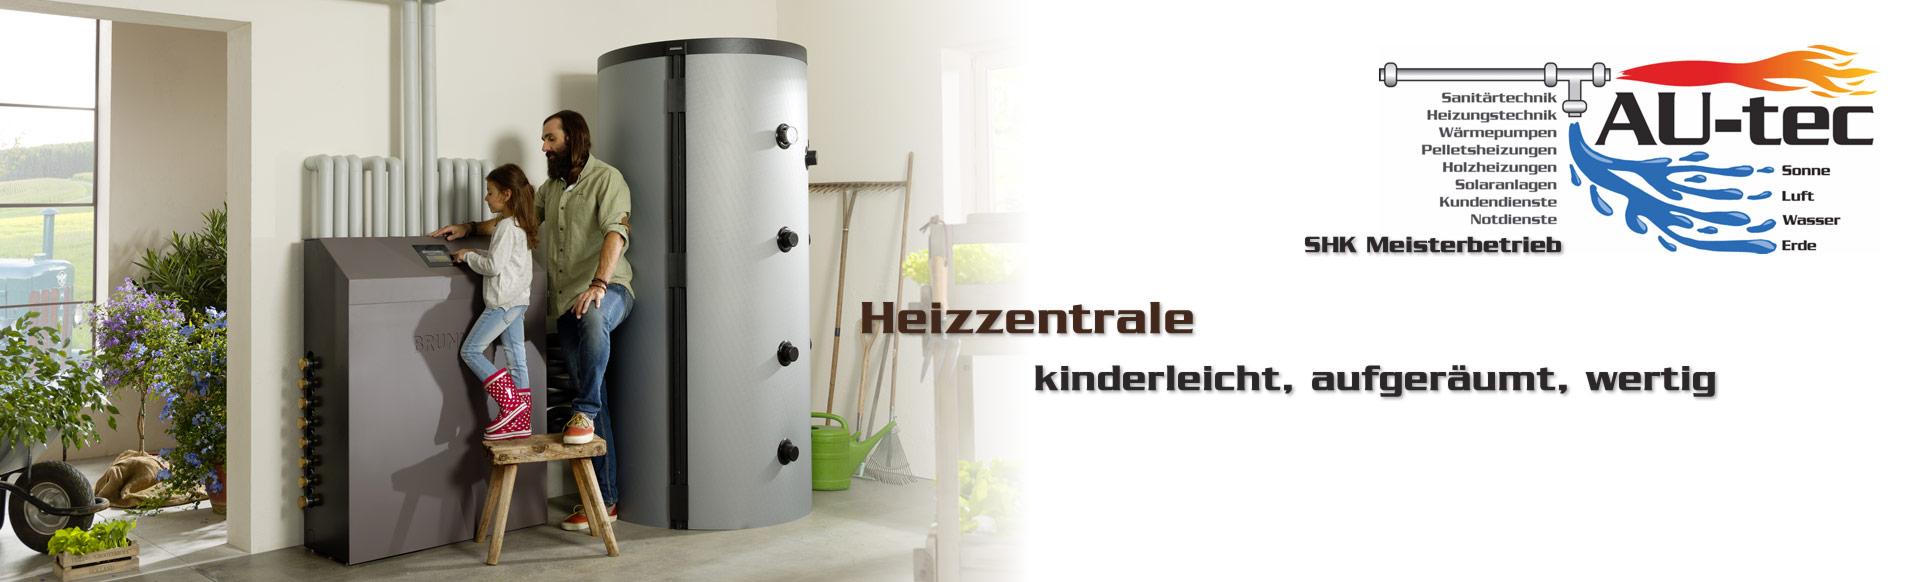 heizzentrale-rastatt-header-autecnet